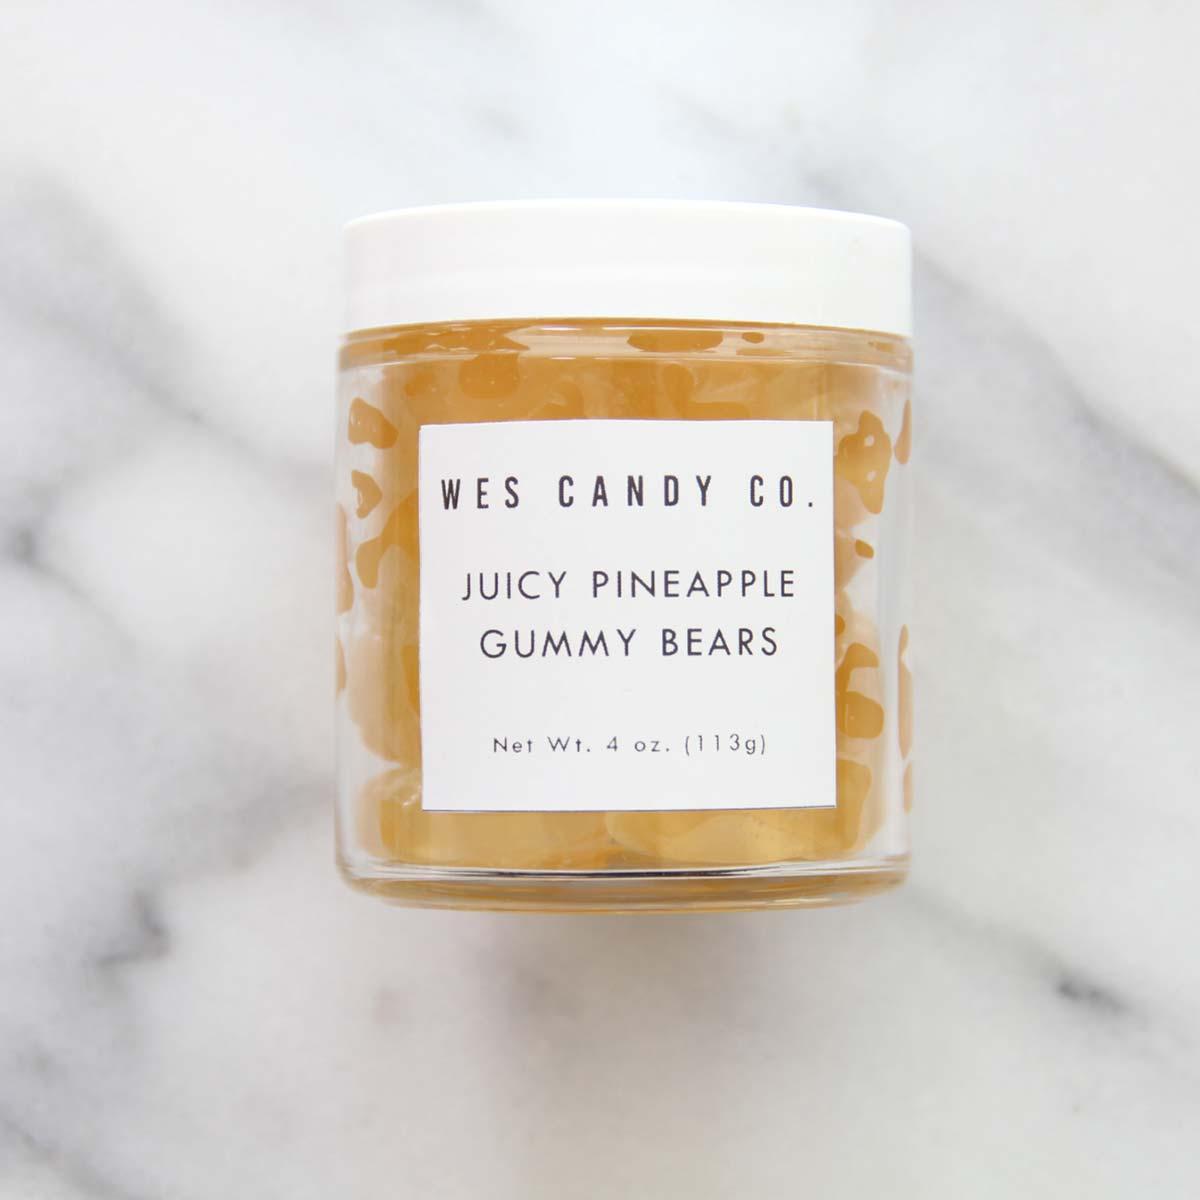 Pineapple gummy bears